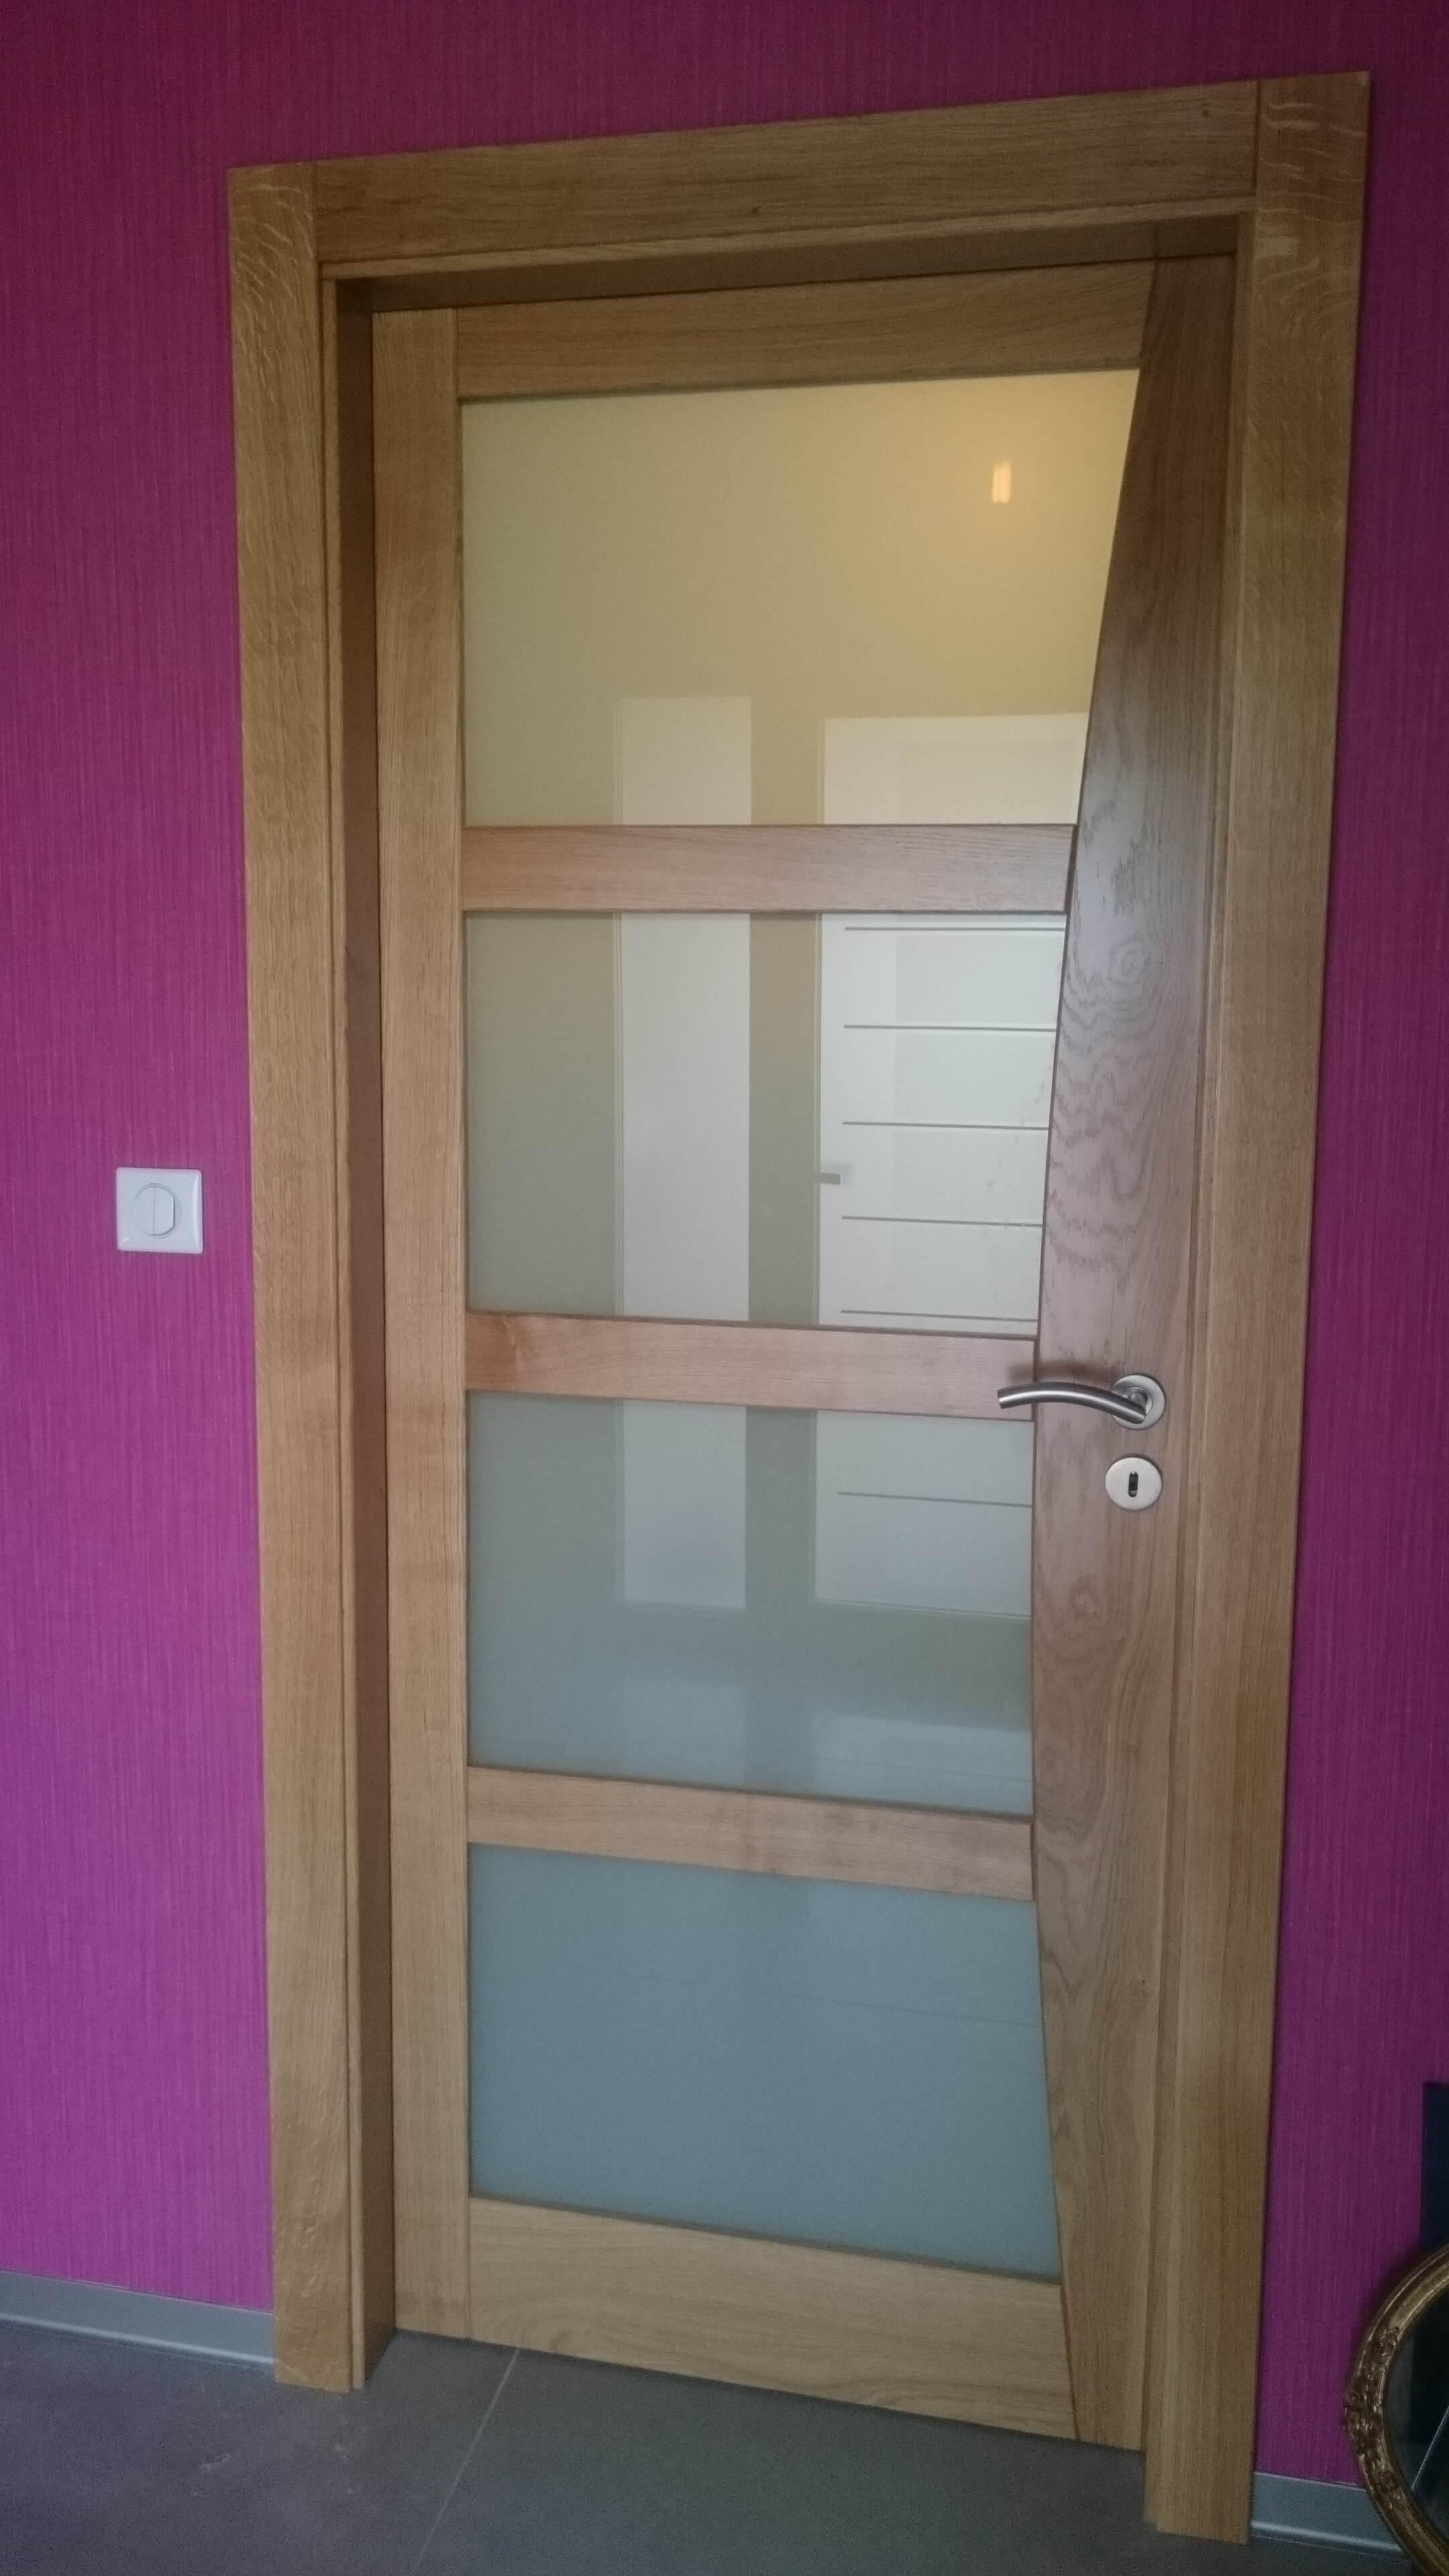 Pose porte interieur beautiful habillage porte interieur - Encadrement de porte leroy merlin ...